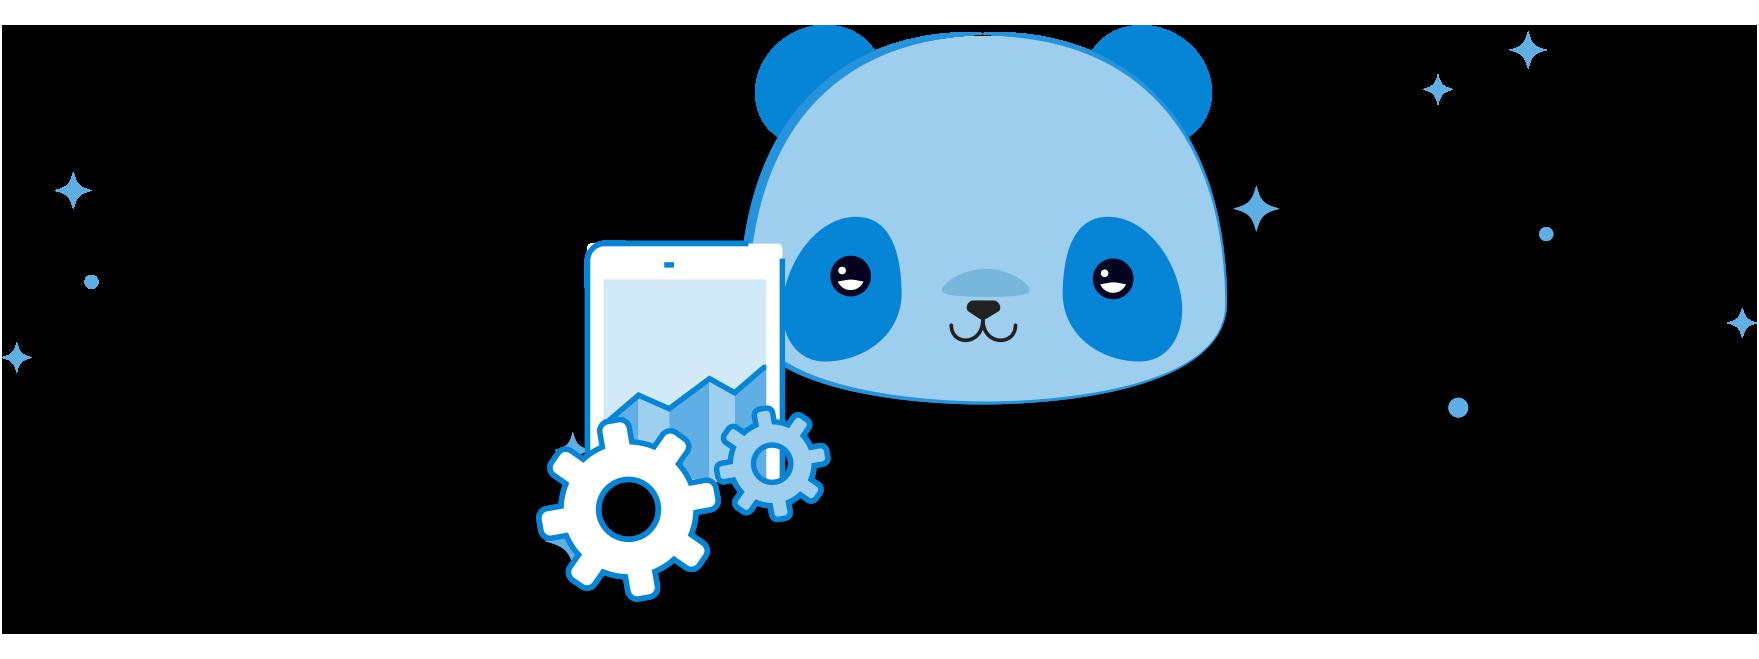 Data Science in Python: Pandas